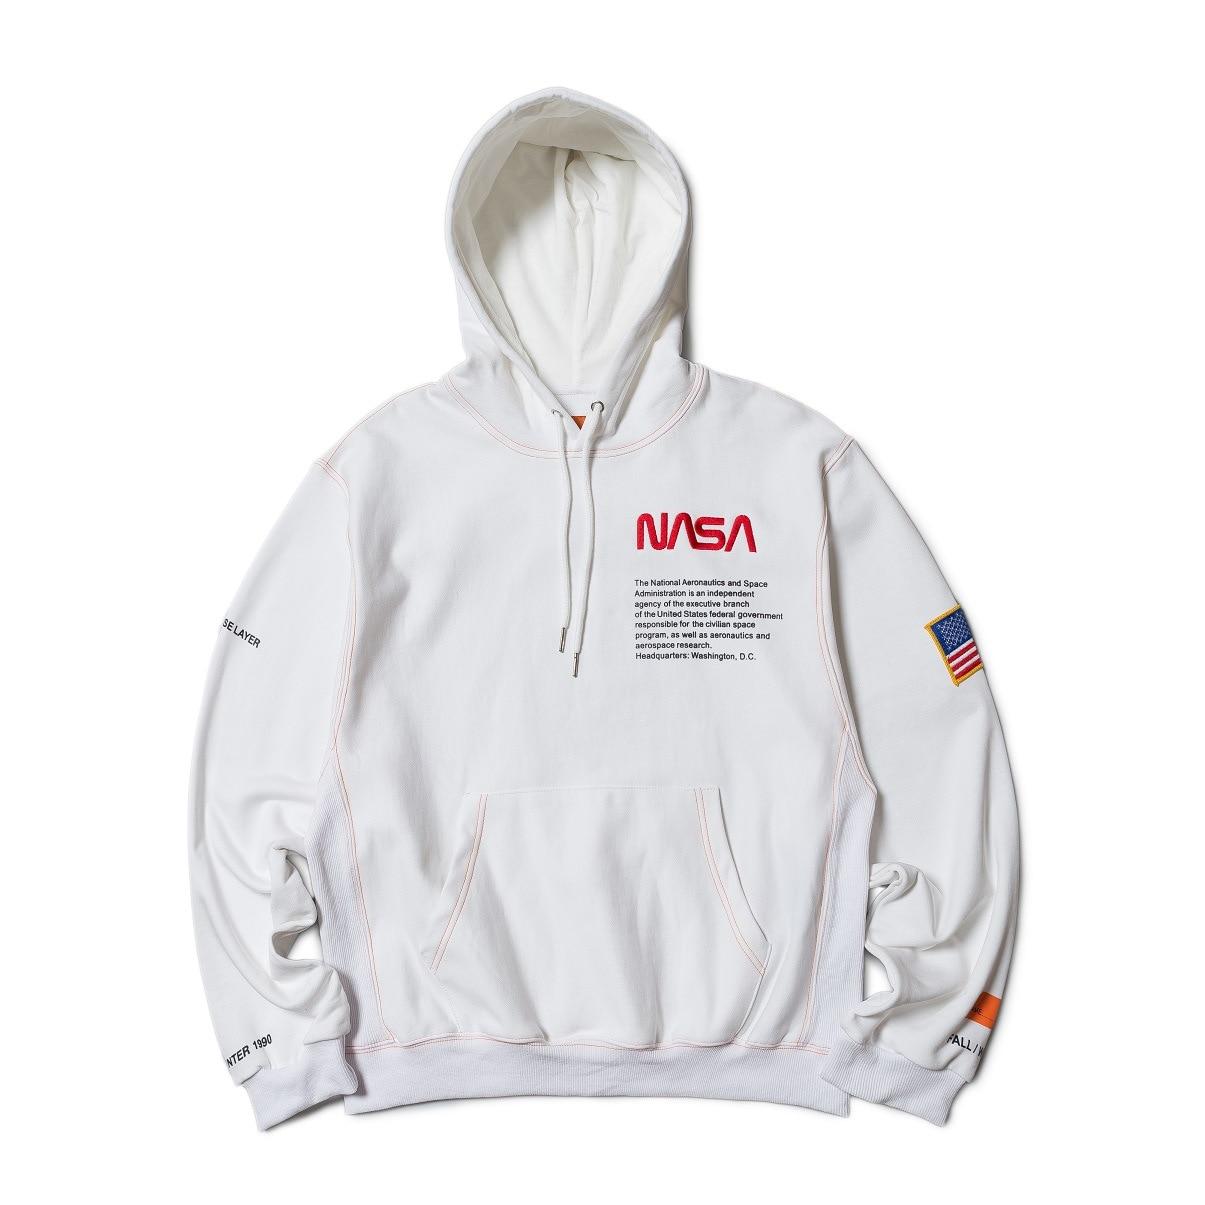 2021 autumn and winter round collar hoodie men and women loose fashion trend Korean version of student jacket customization 6